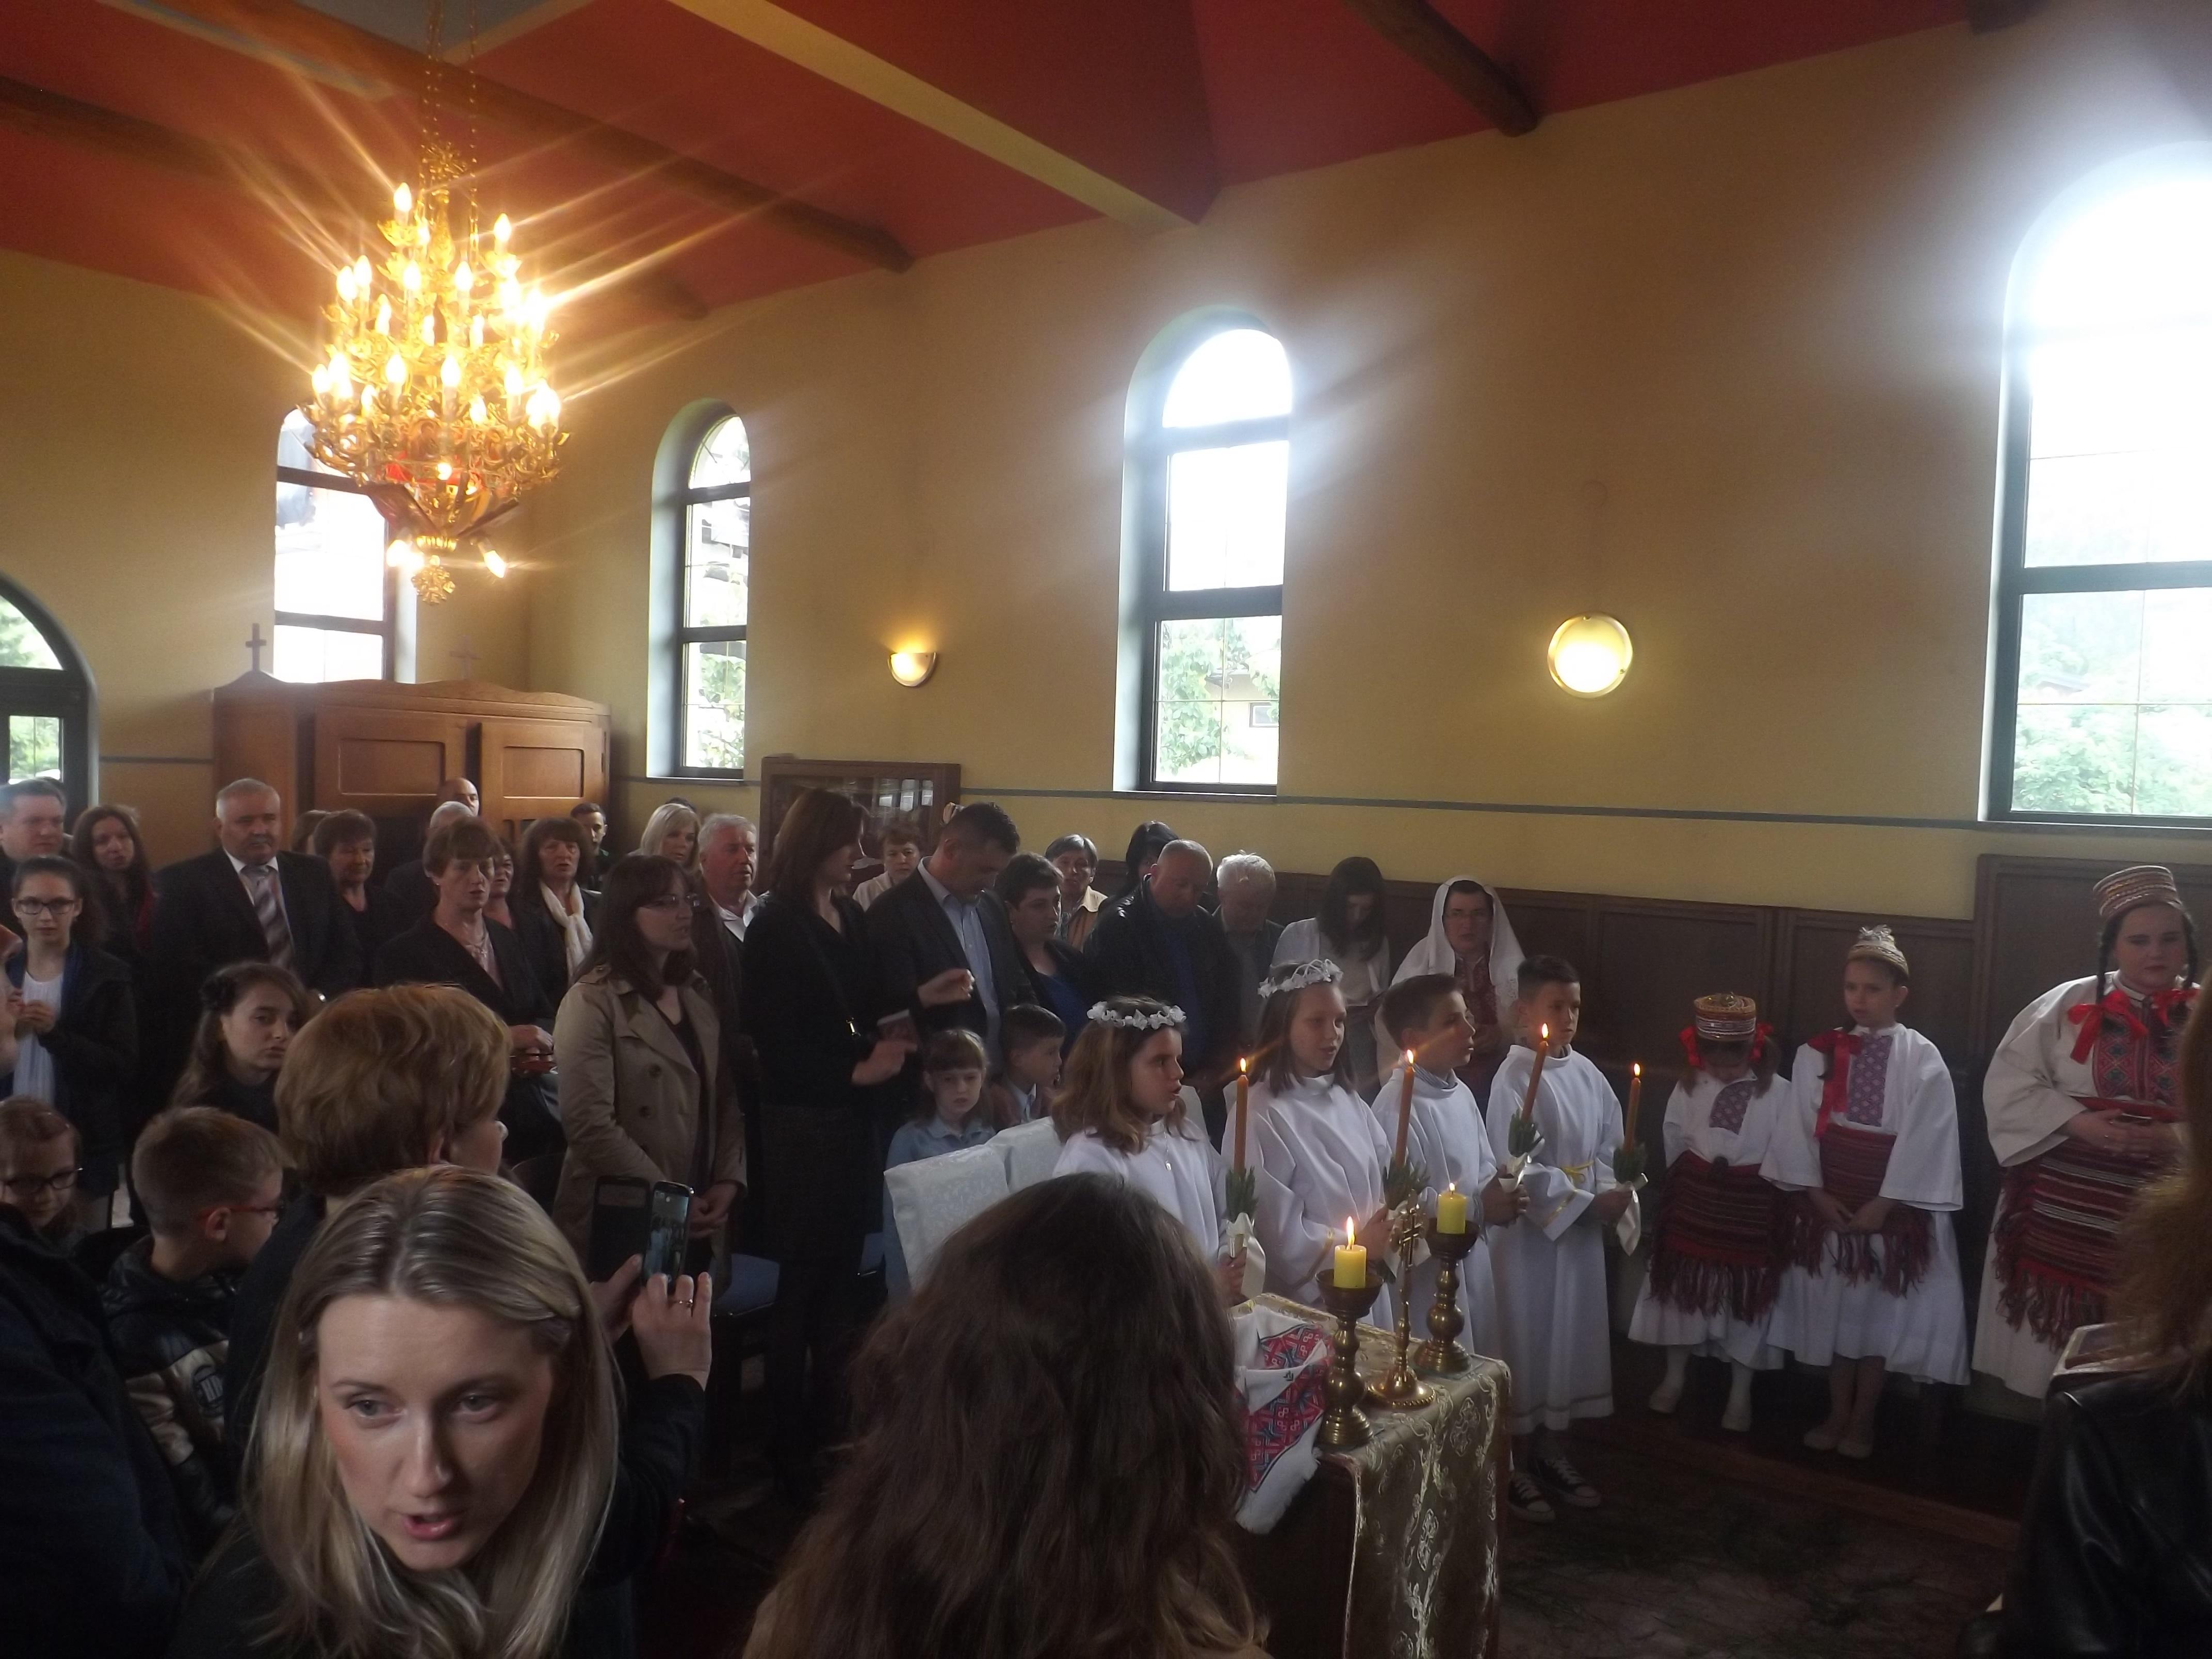 Na blagdan Pedesetnice velika duhovna radost u Samoboru